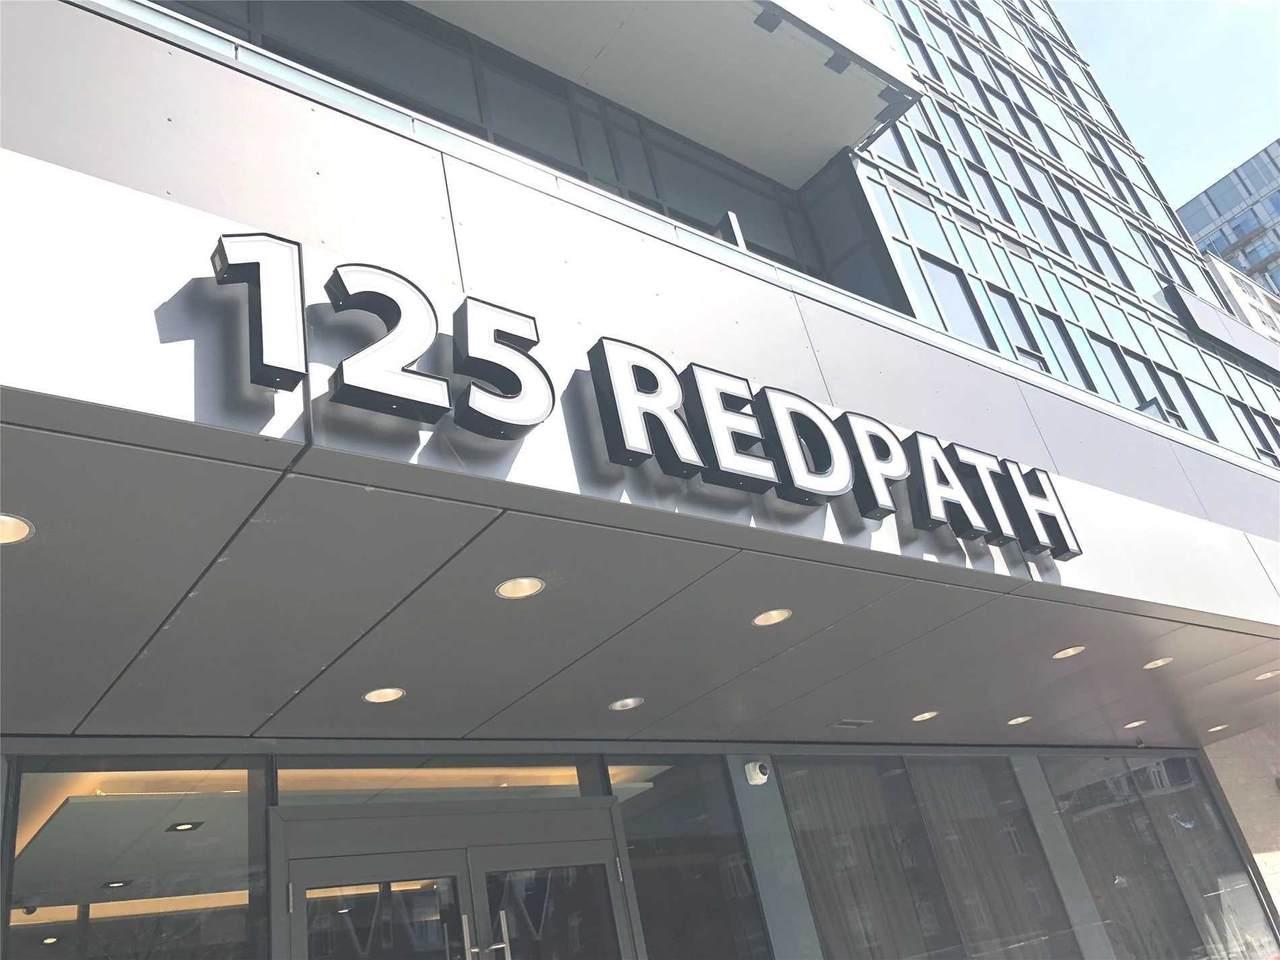 125 Redpath Ave - Photo 1